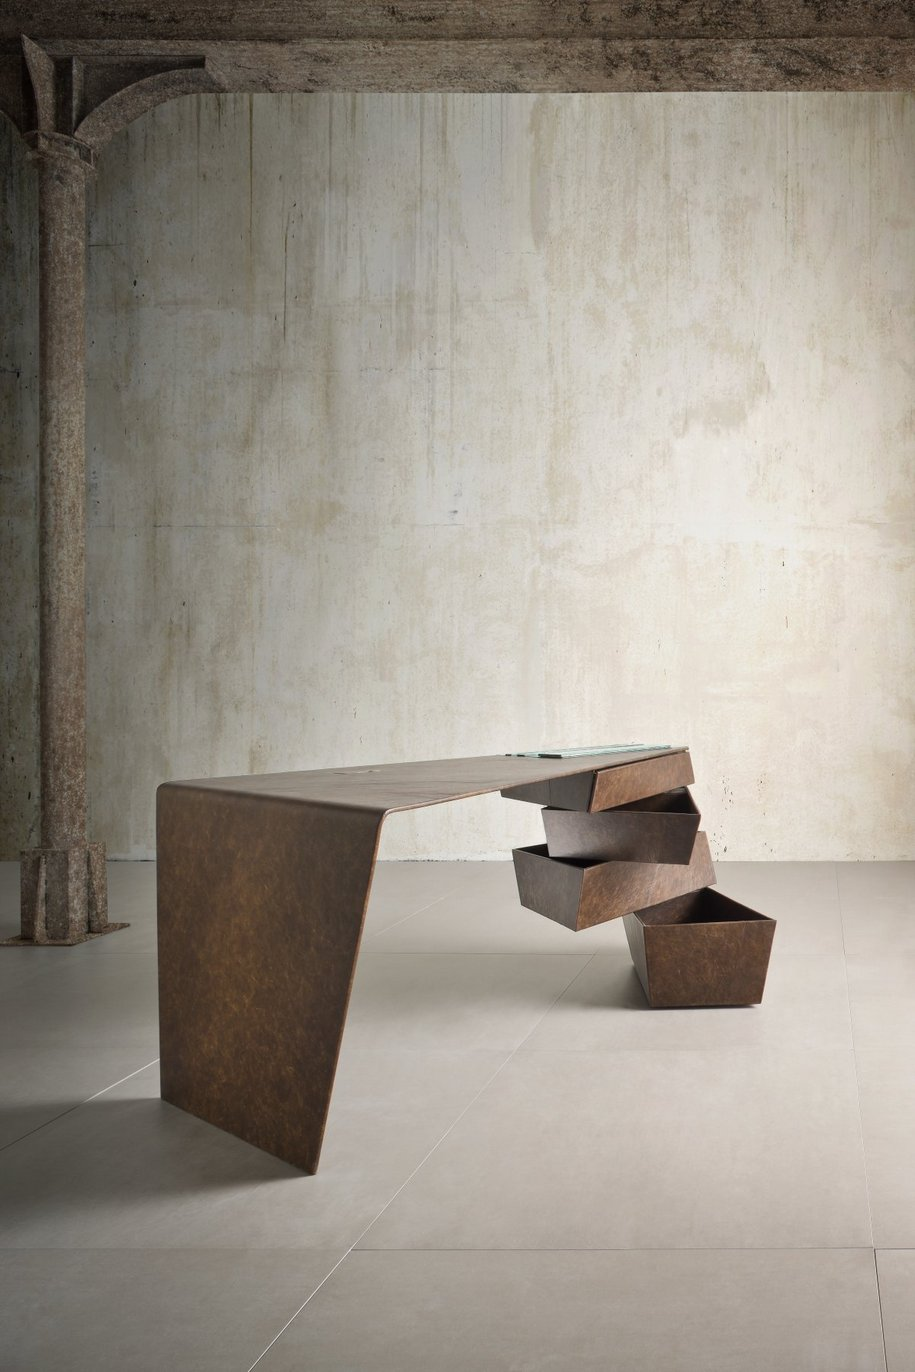 Torque Desk - рабочий стол с мужским характером